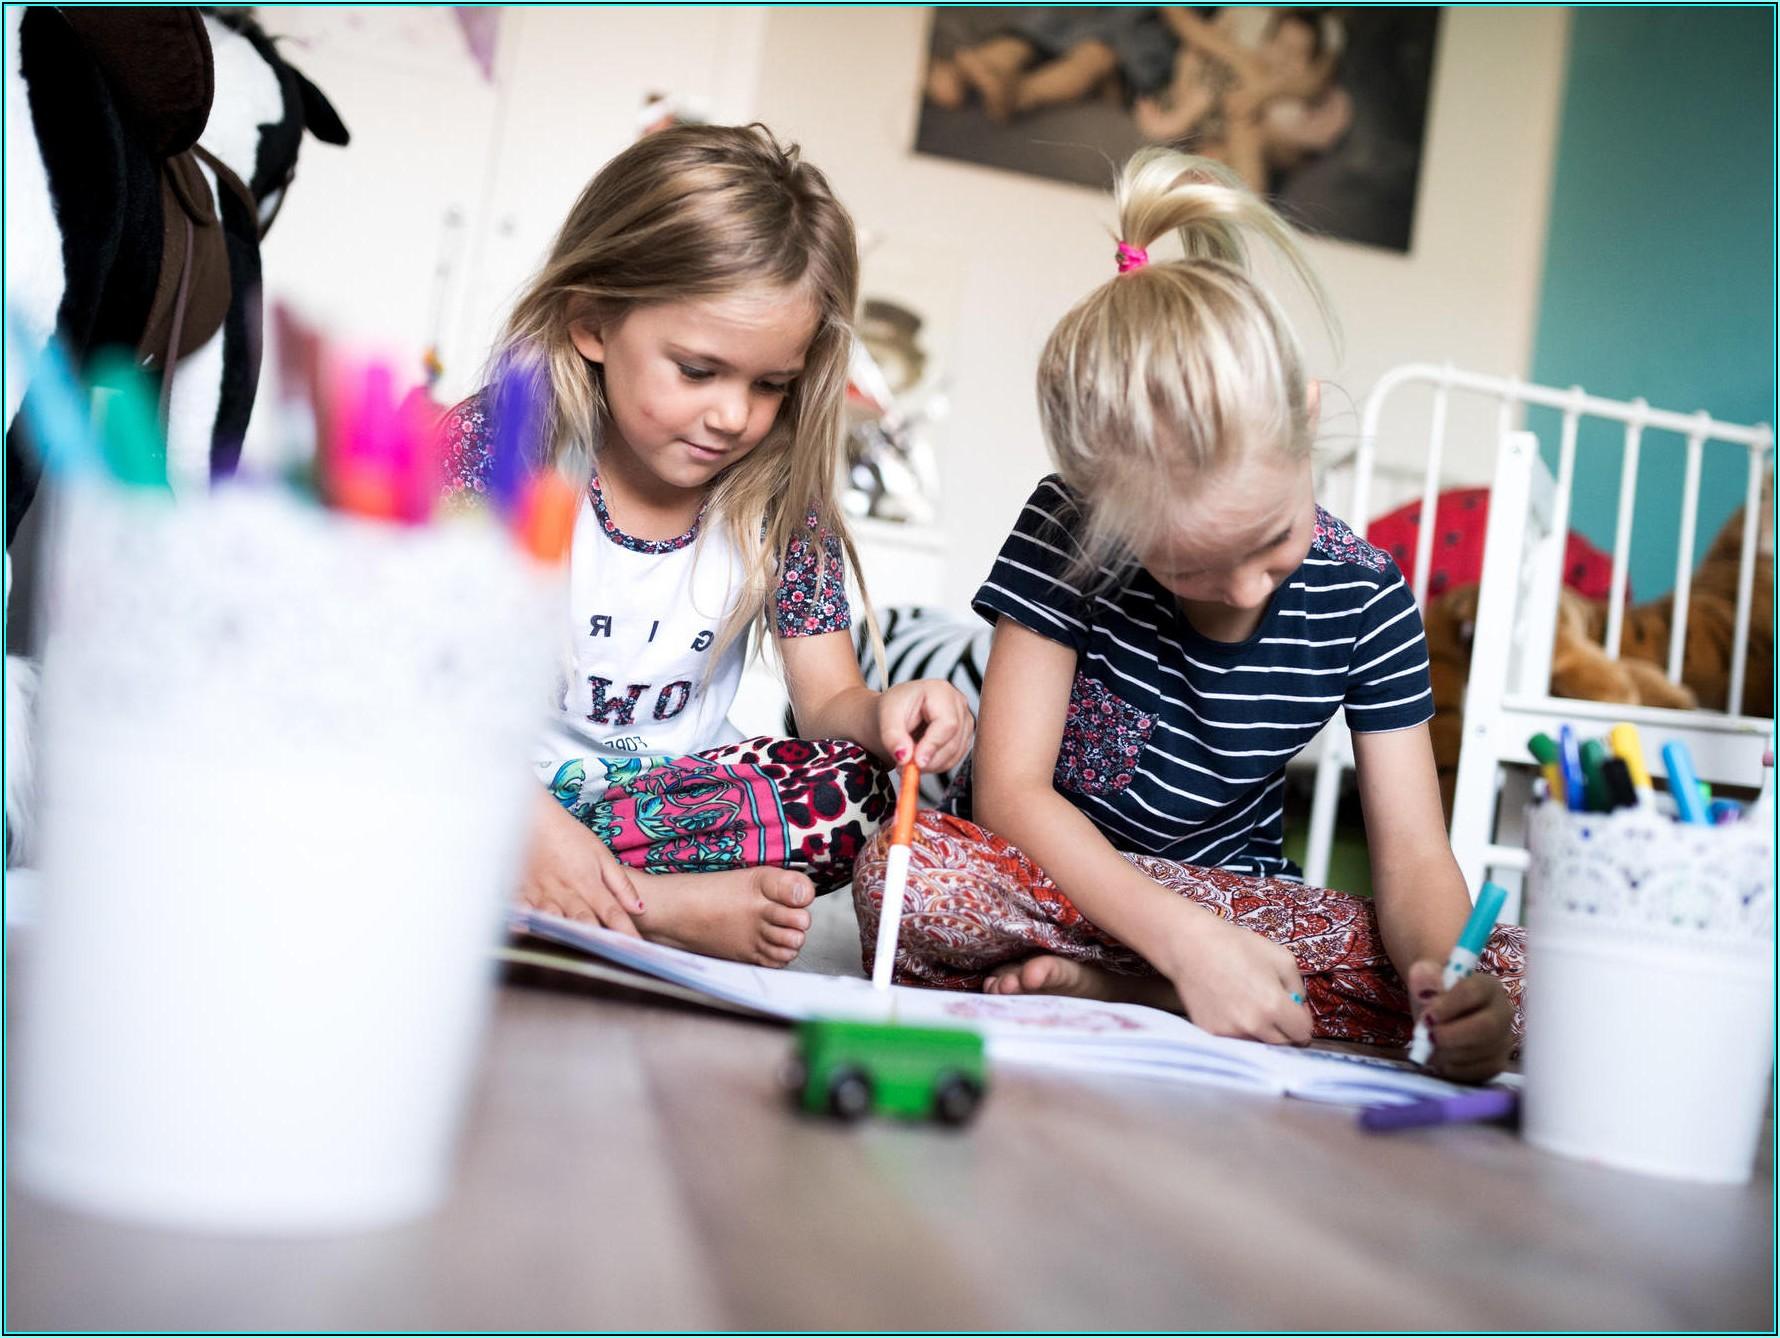 Chaos Im Kinderzimmer Pubertät